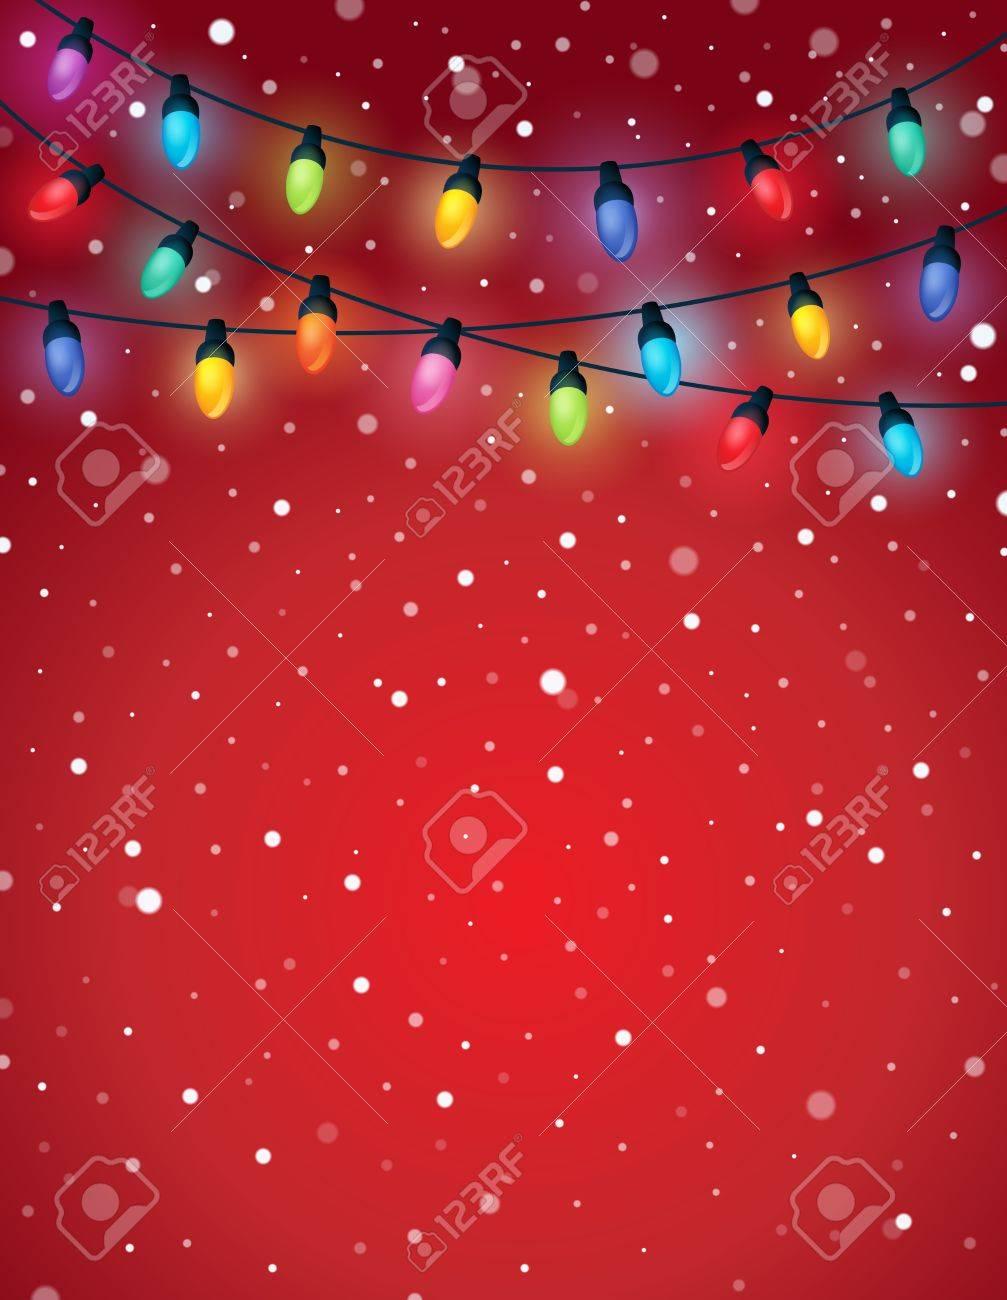 Christmas lights theme image 5 - eps10 vector illustration. Stock Vector - 48150577